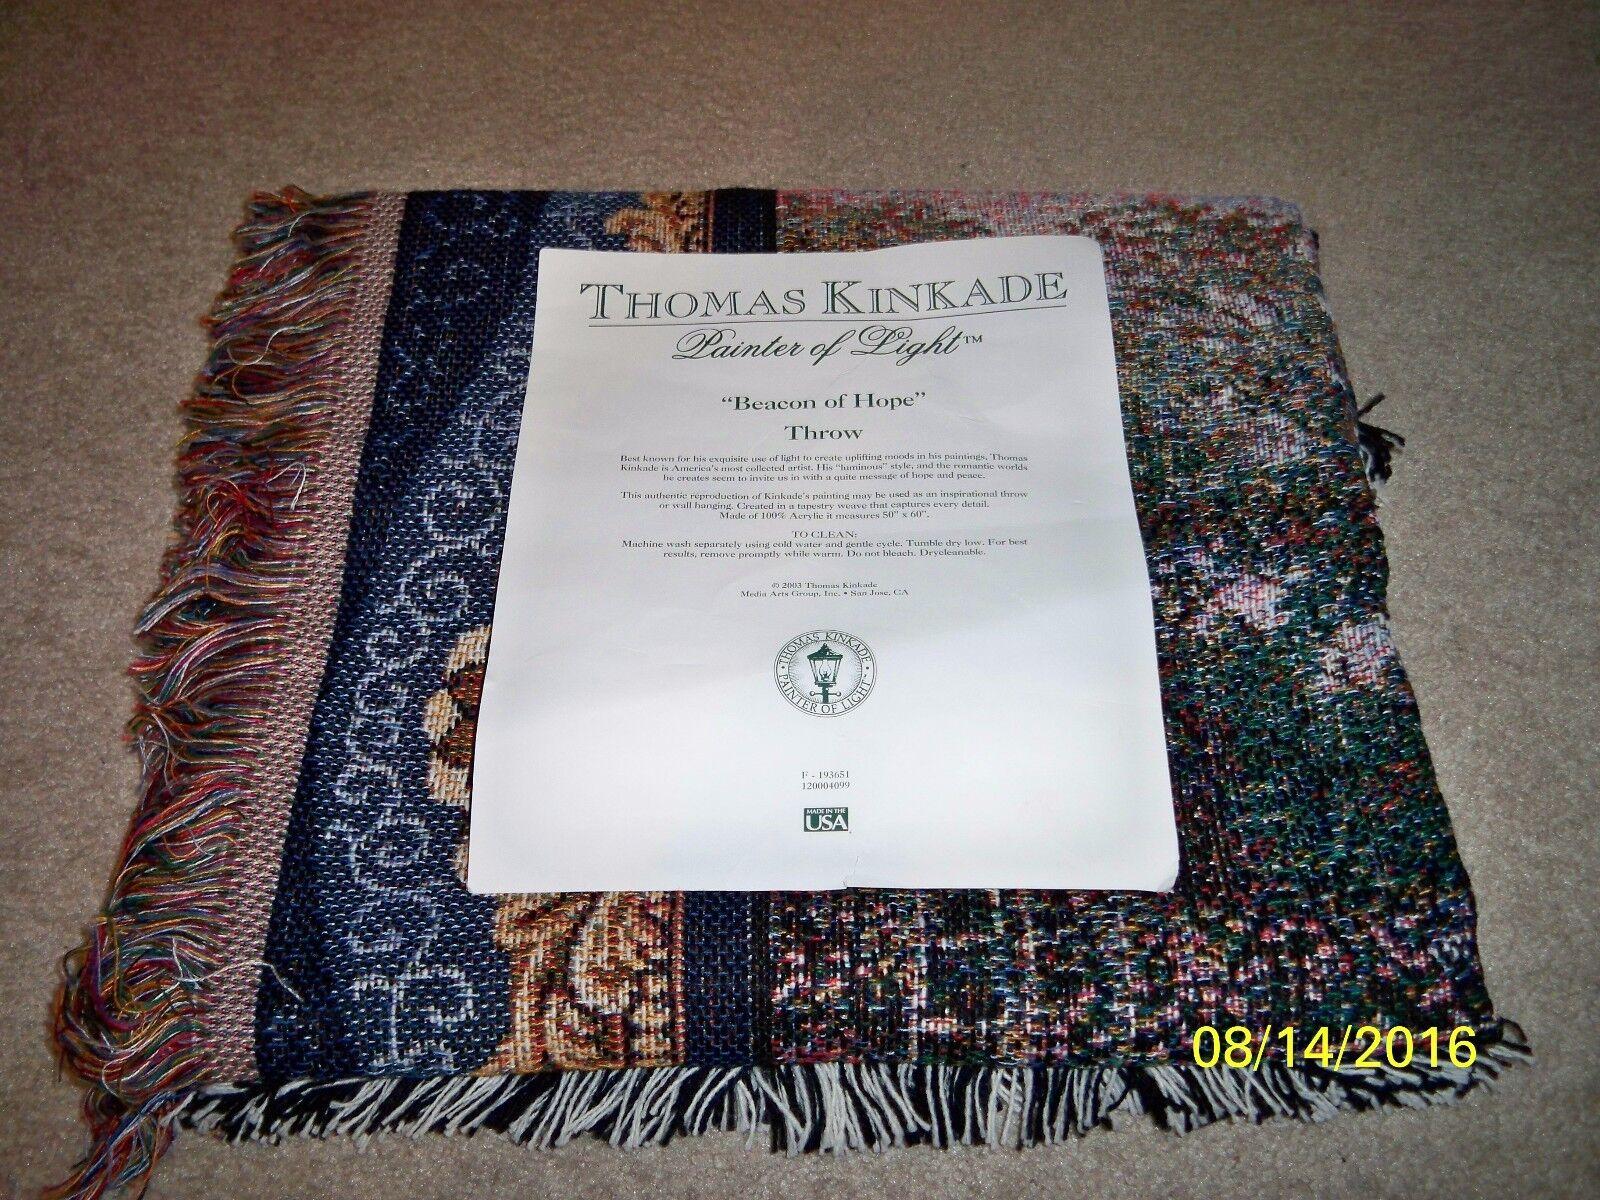 BRAND NEW  THOMAS KINKADE PAINTER OF LIGHT  BEACON OF HOPE  50  x 60  THROW